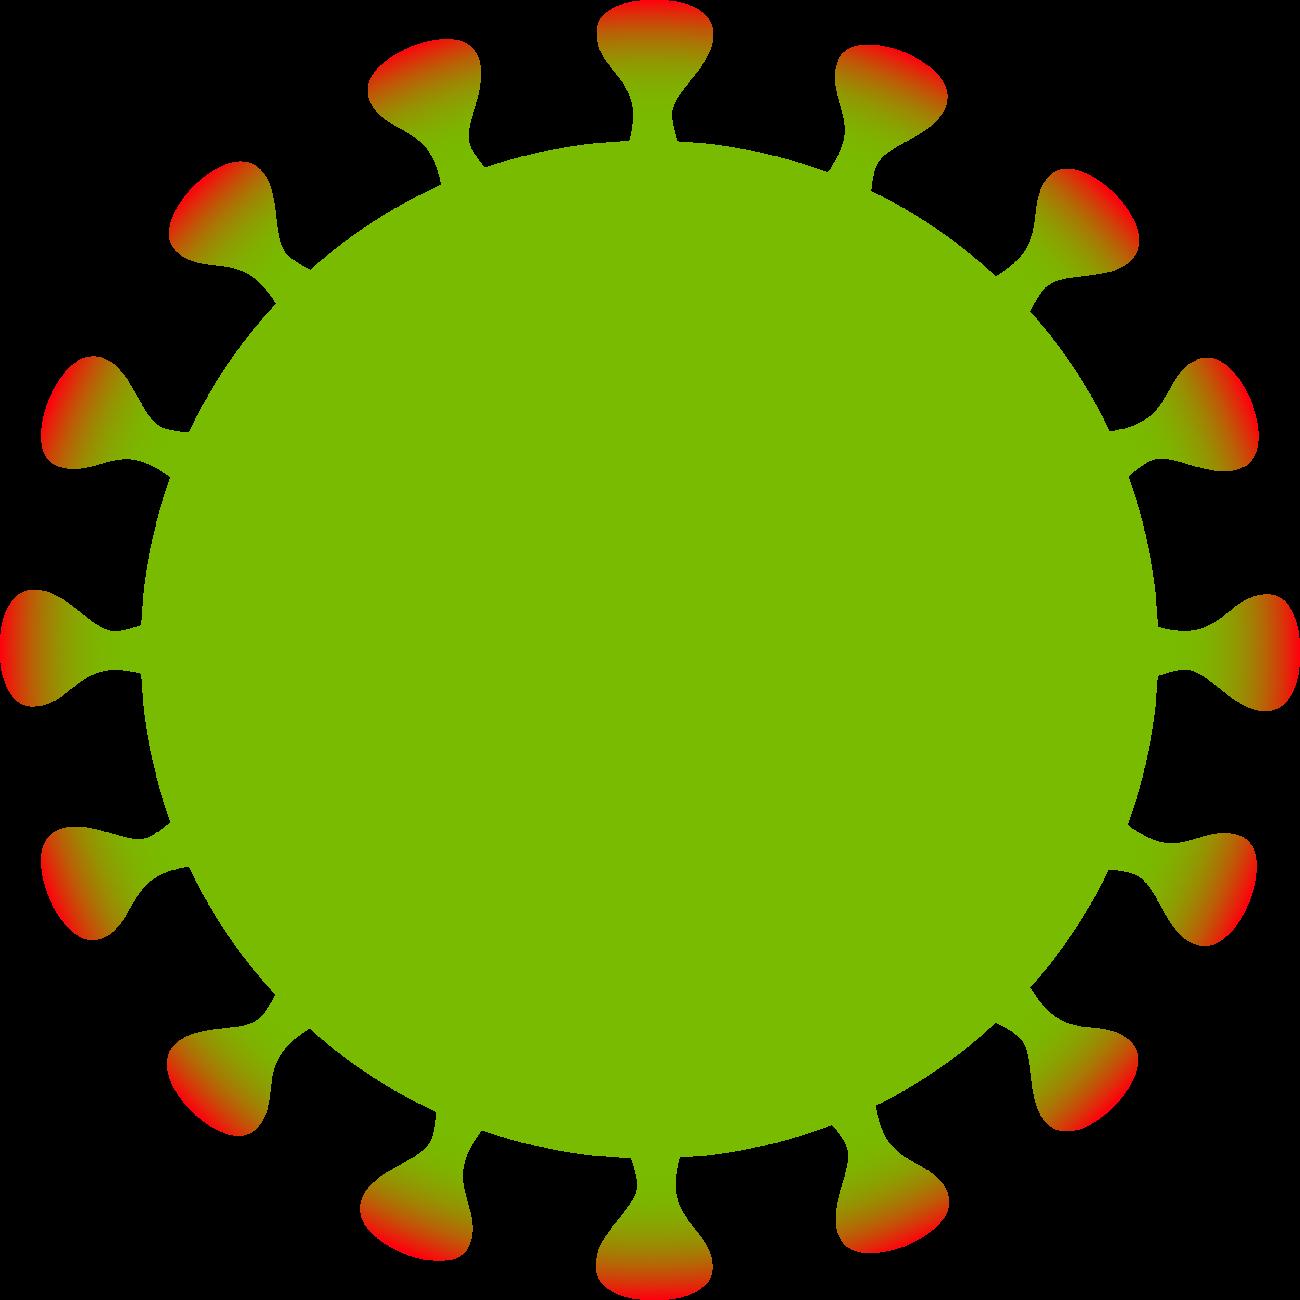 Free image from iXimus.de: Coronavirus, green, red, cropped, #0000131